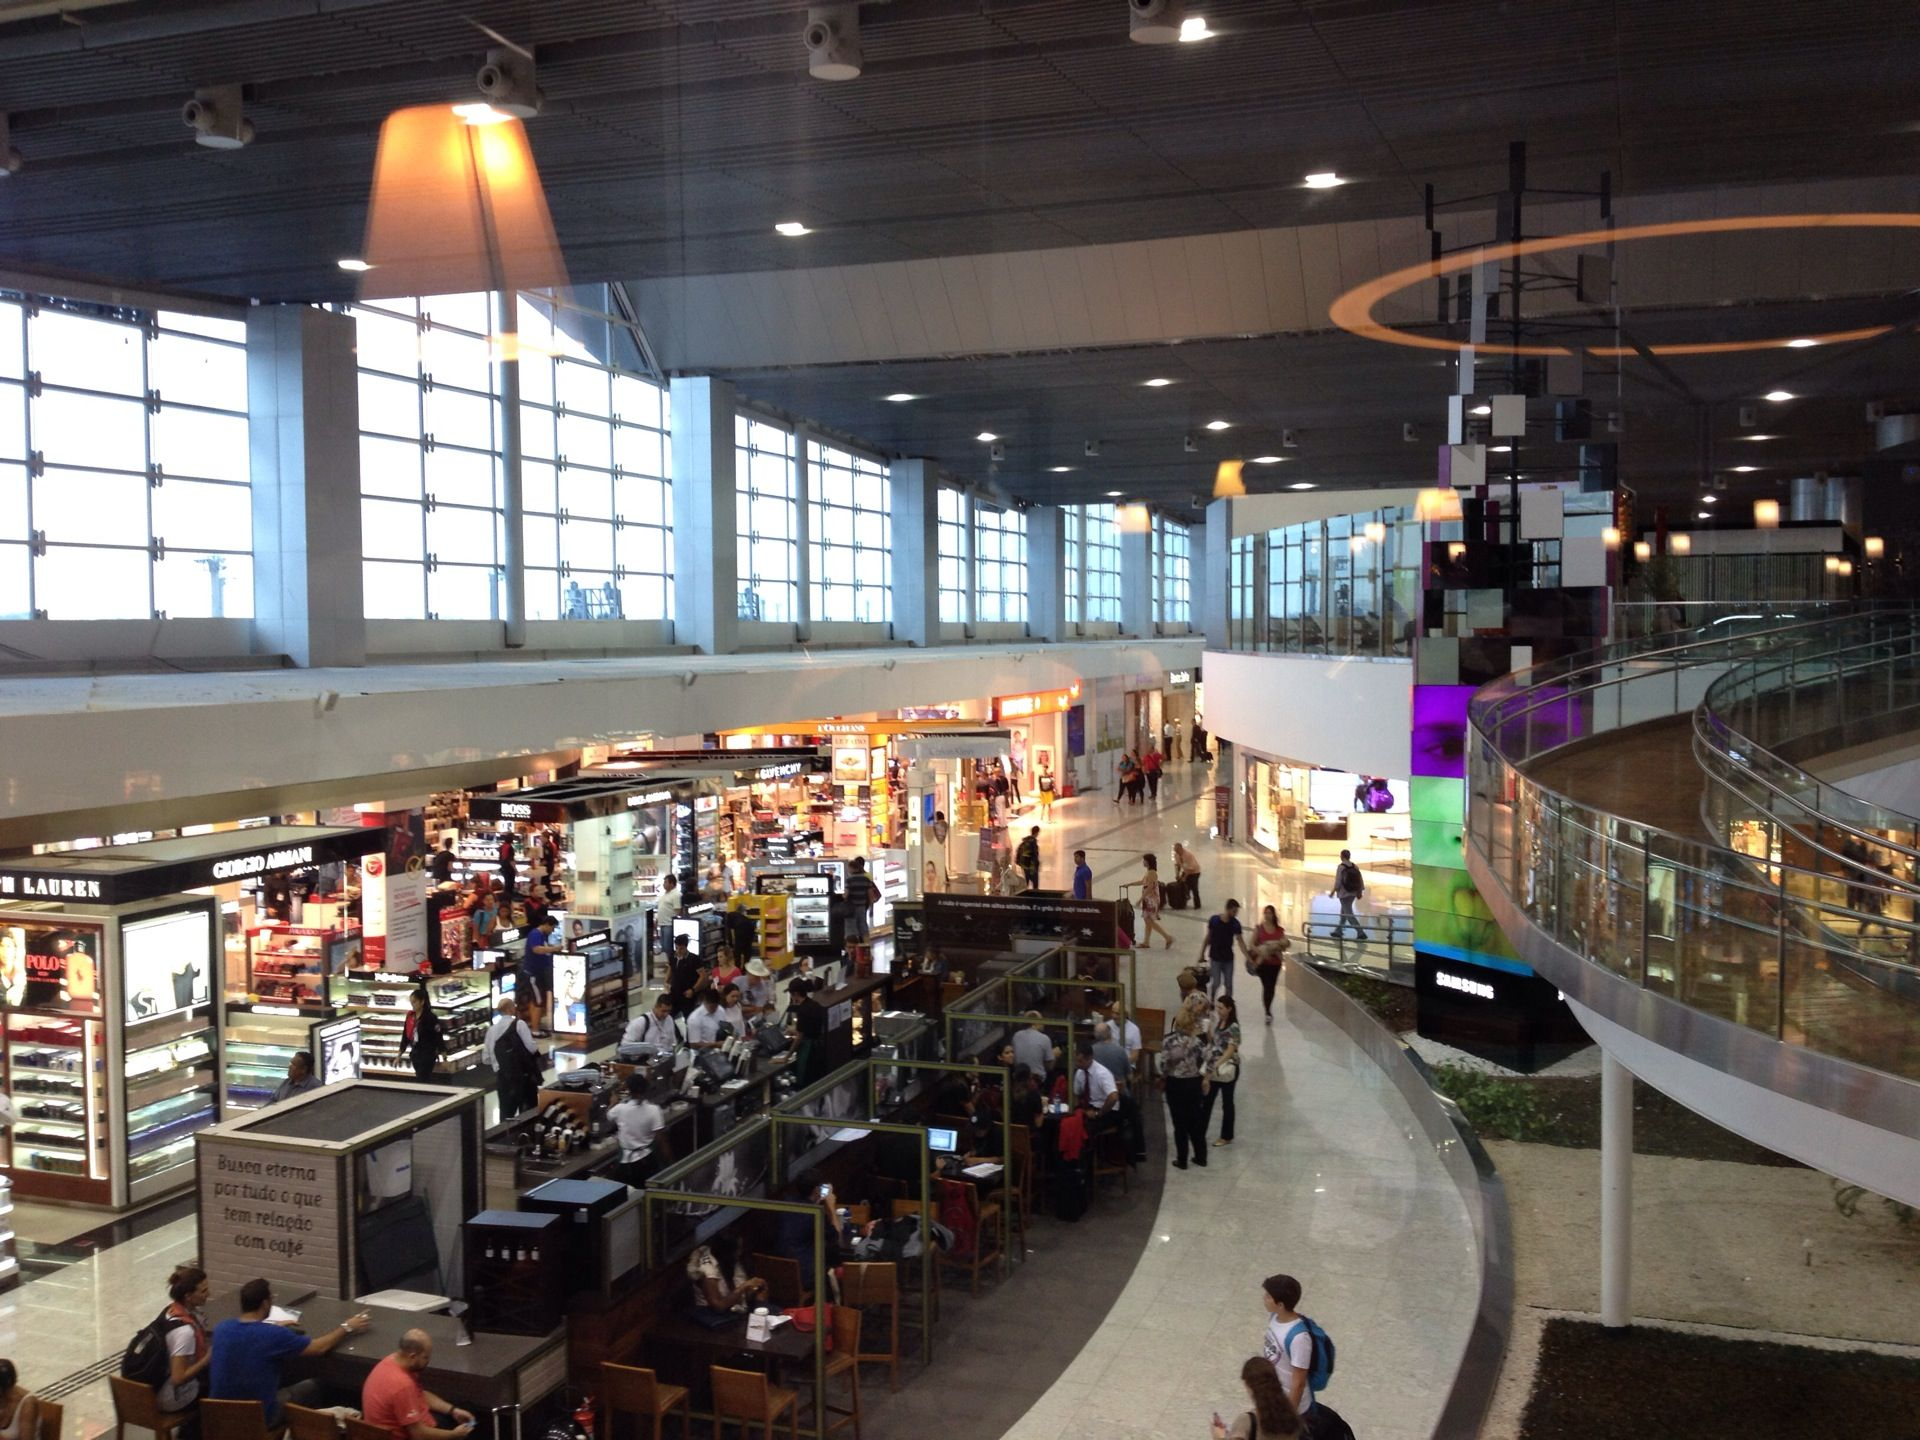 Aeroporto Gru : Aeroporto internacional de são paulo guarulhos gru en